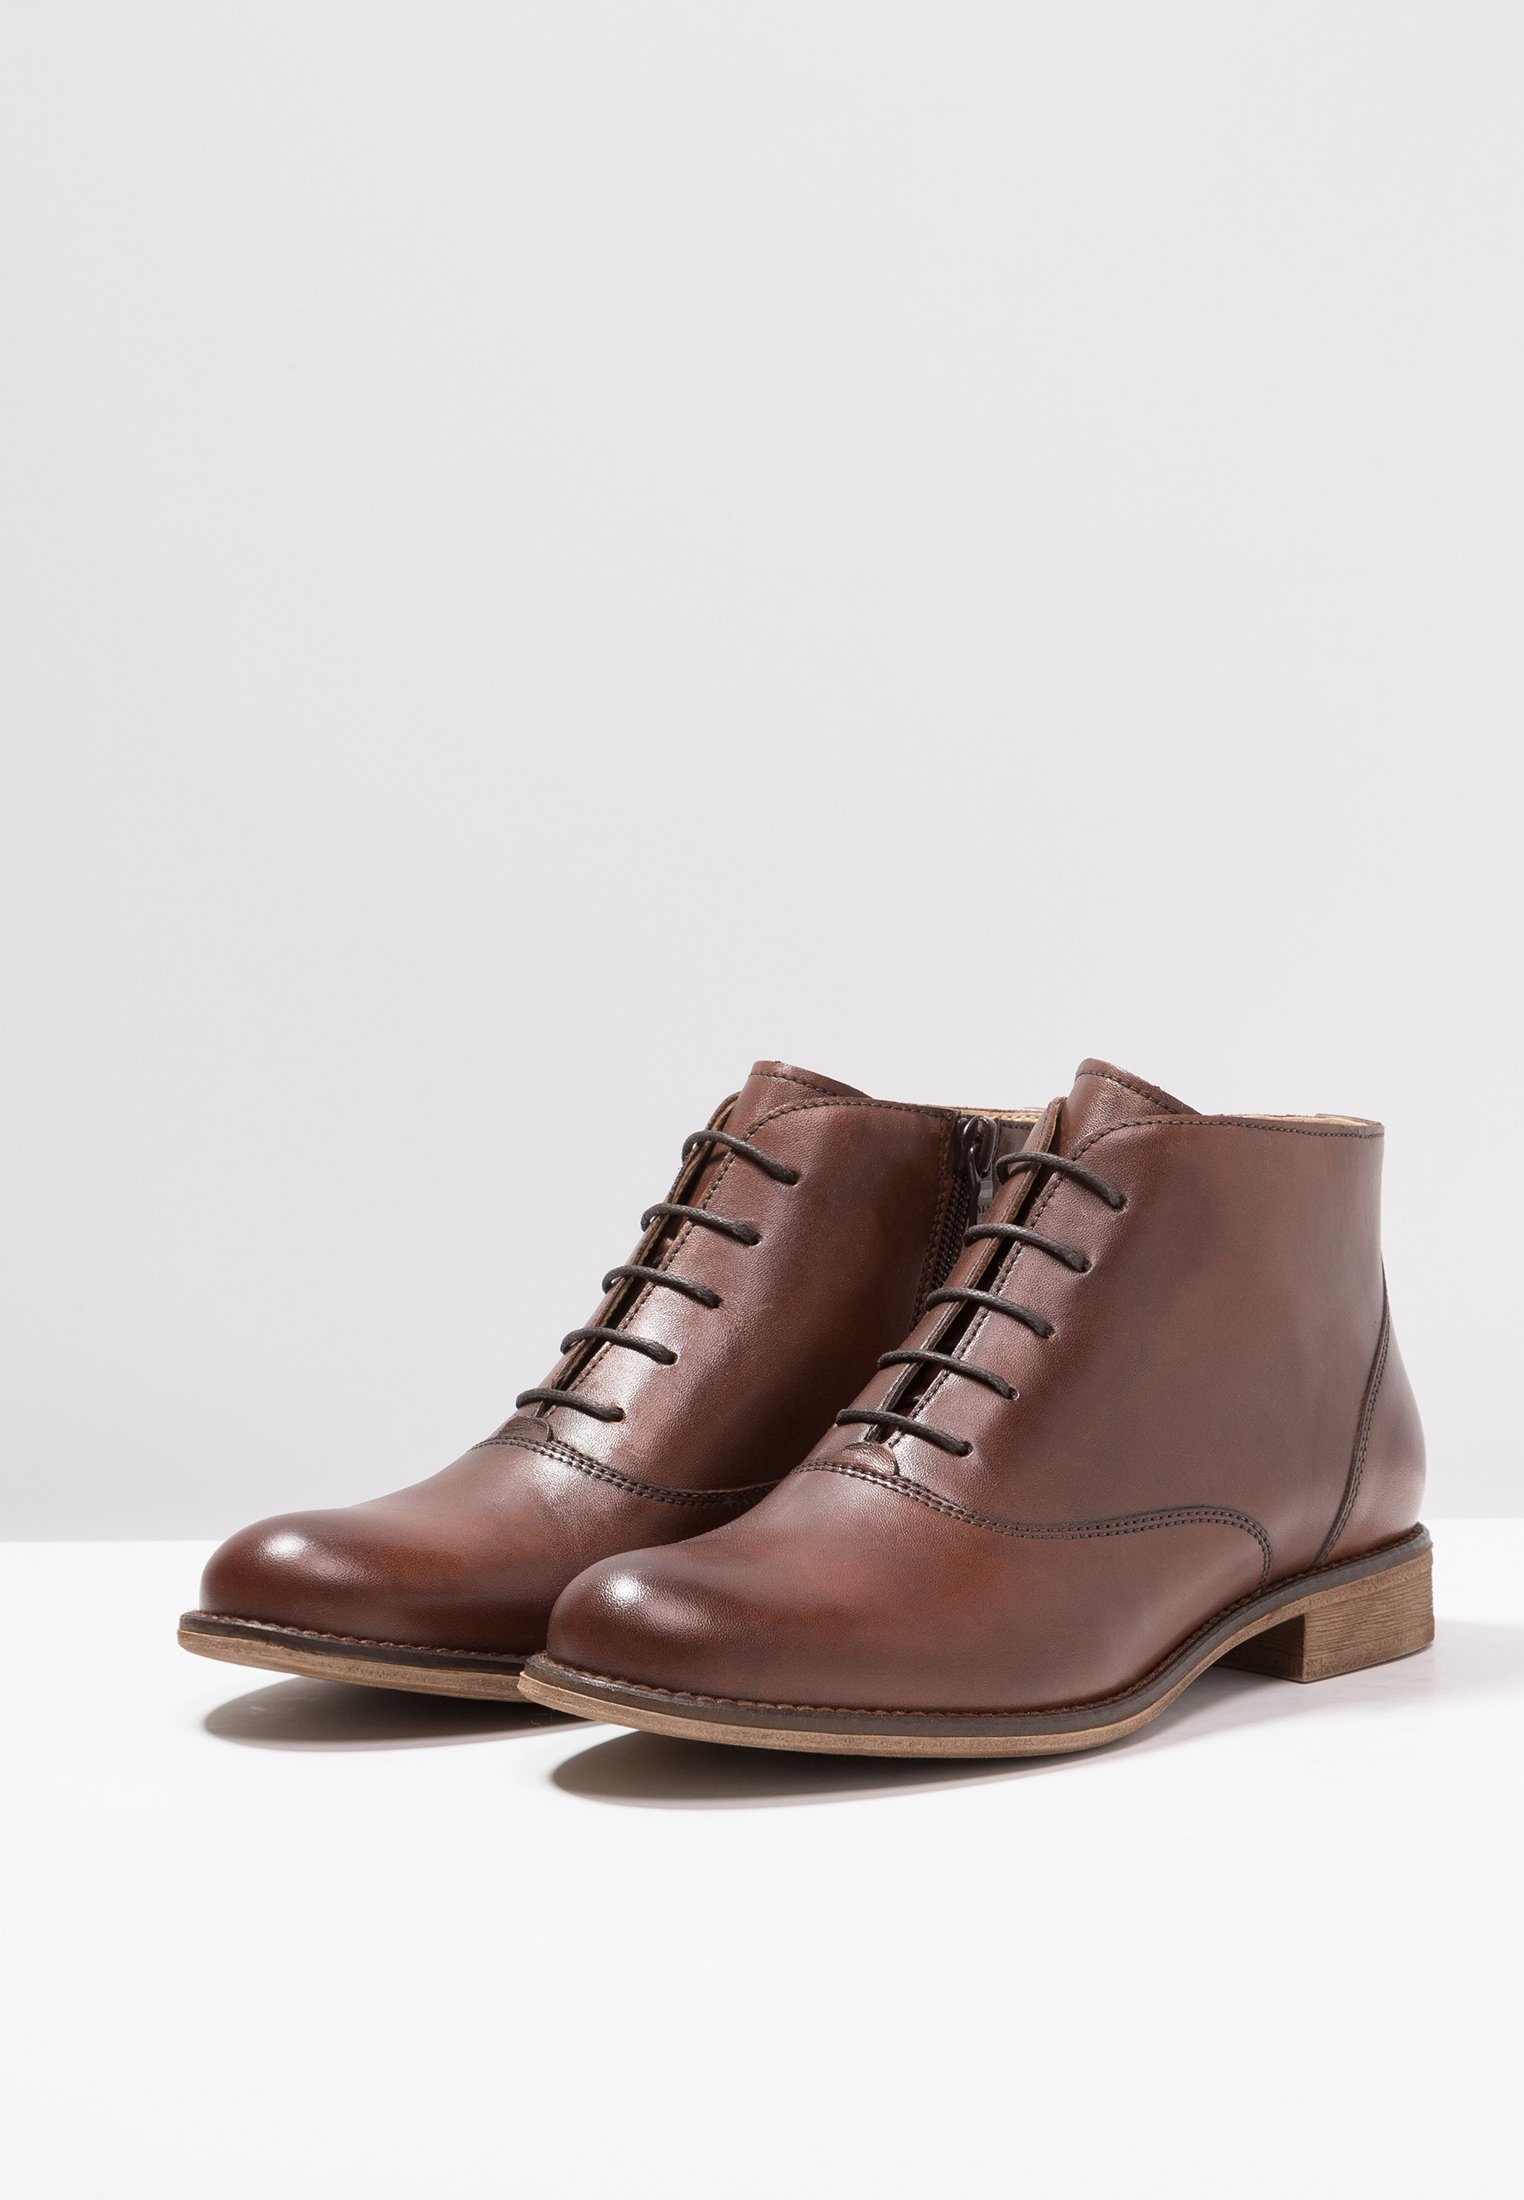 Pier One Ankle Boot dark brown